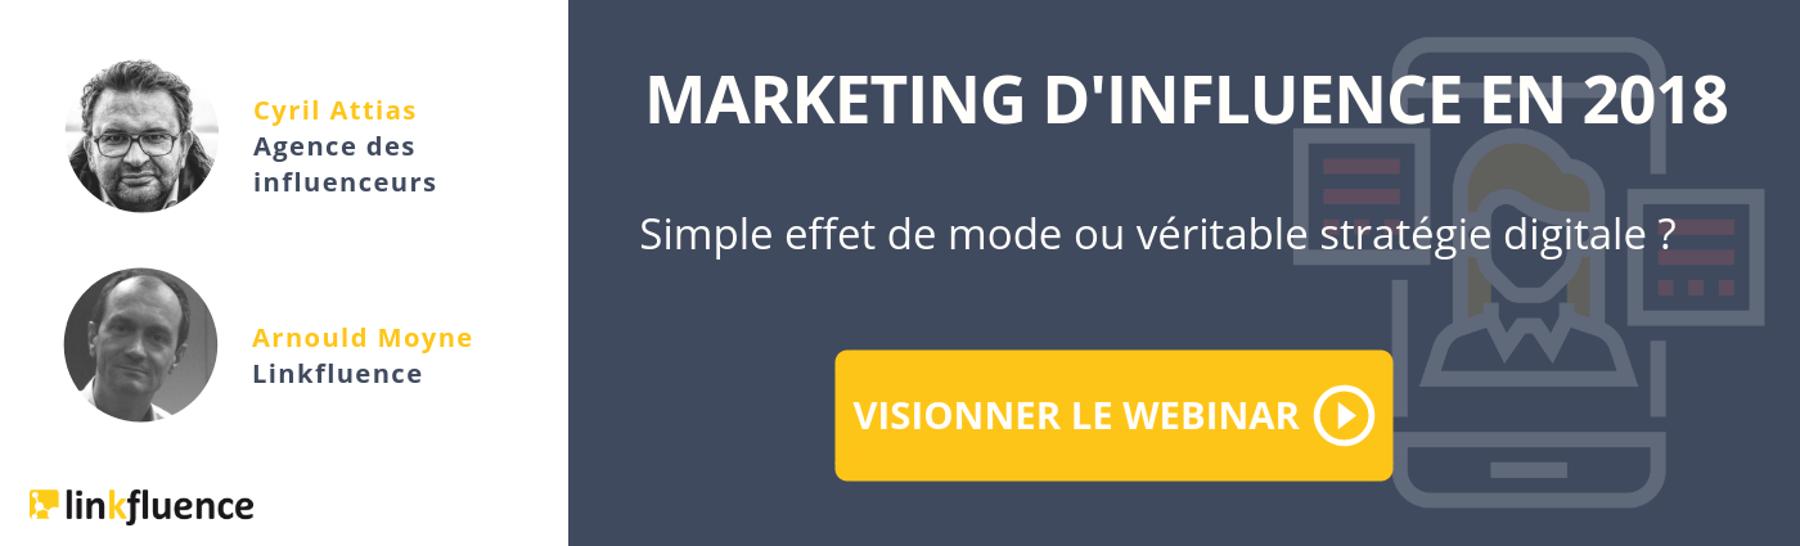 Webinar : marketing d'influence en 2018